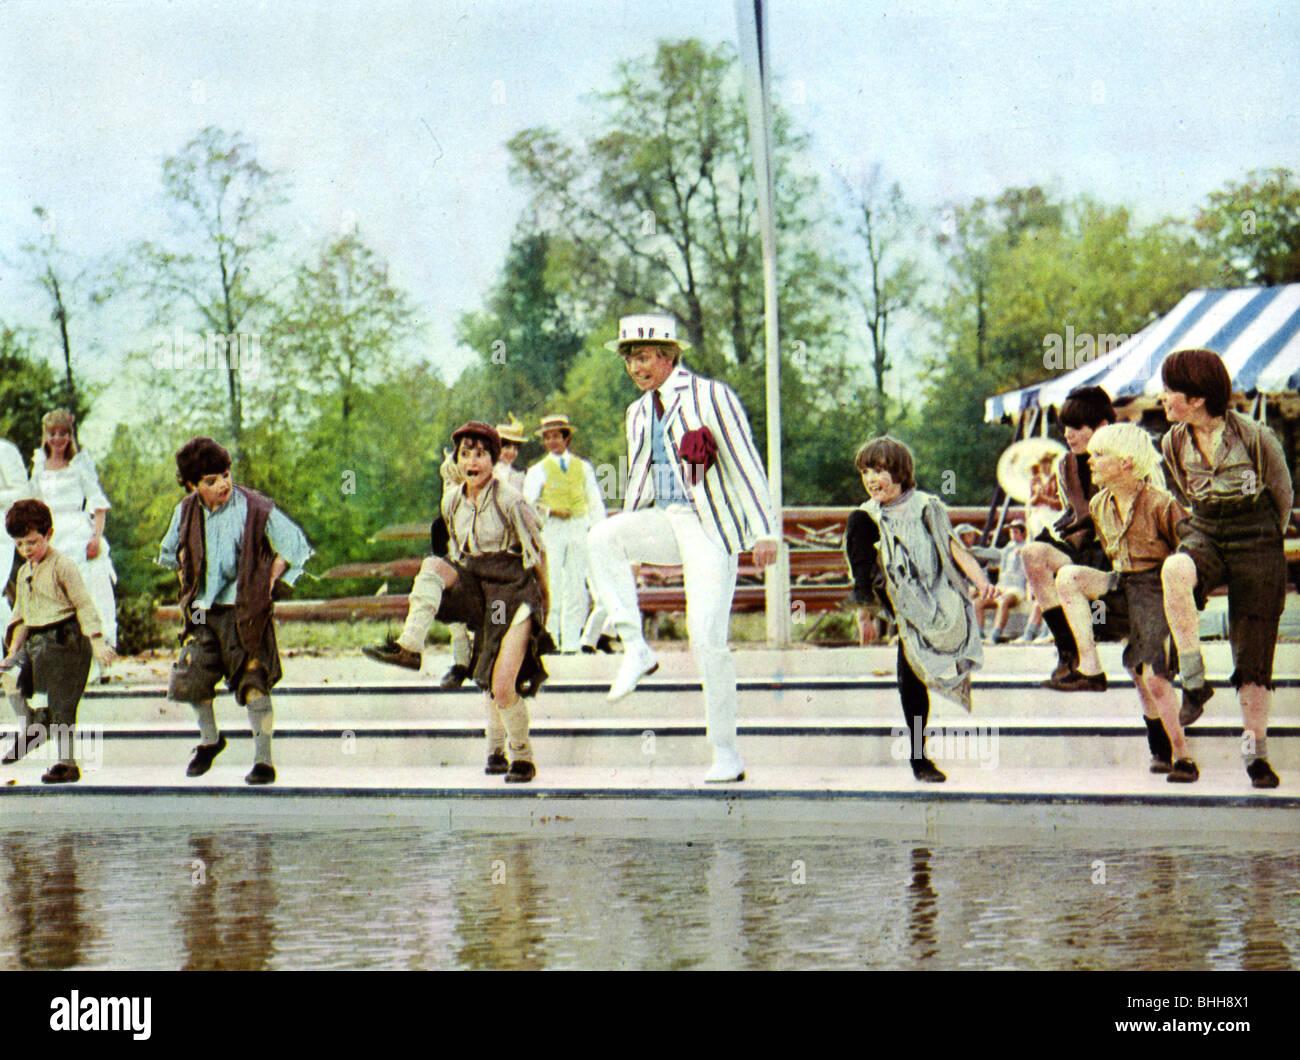 HALB ein SIXPENCE-1967 Paramount Film mit Tommy Steele Stockbild